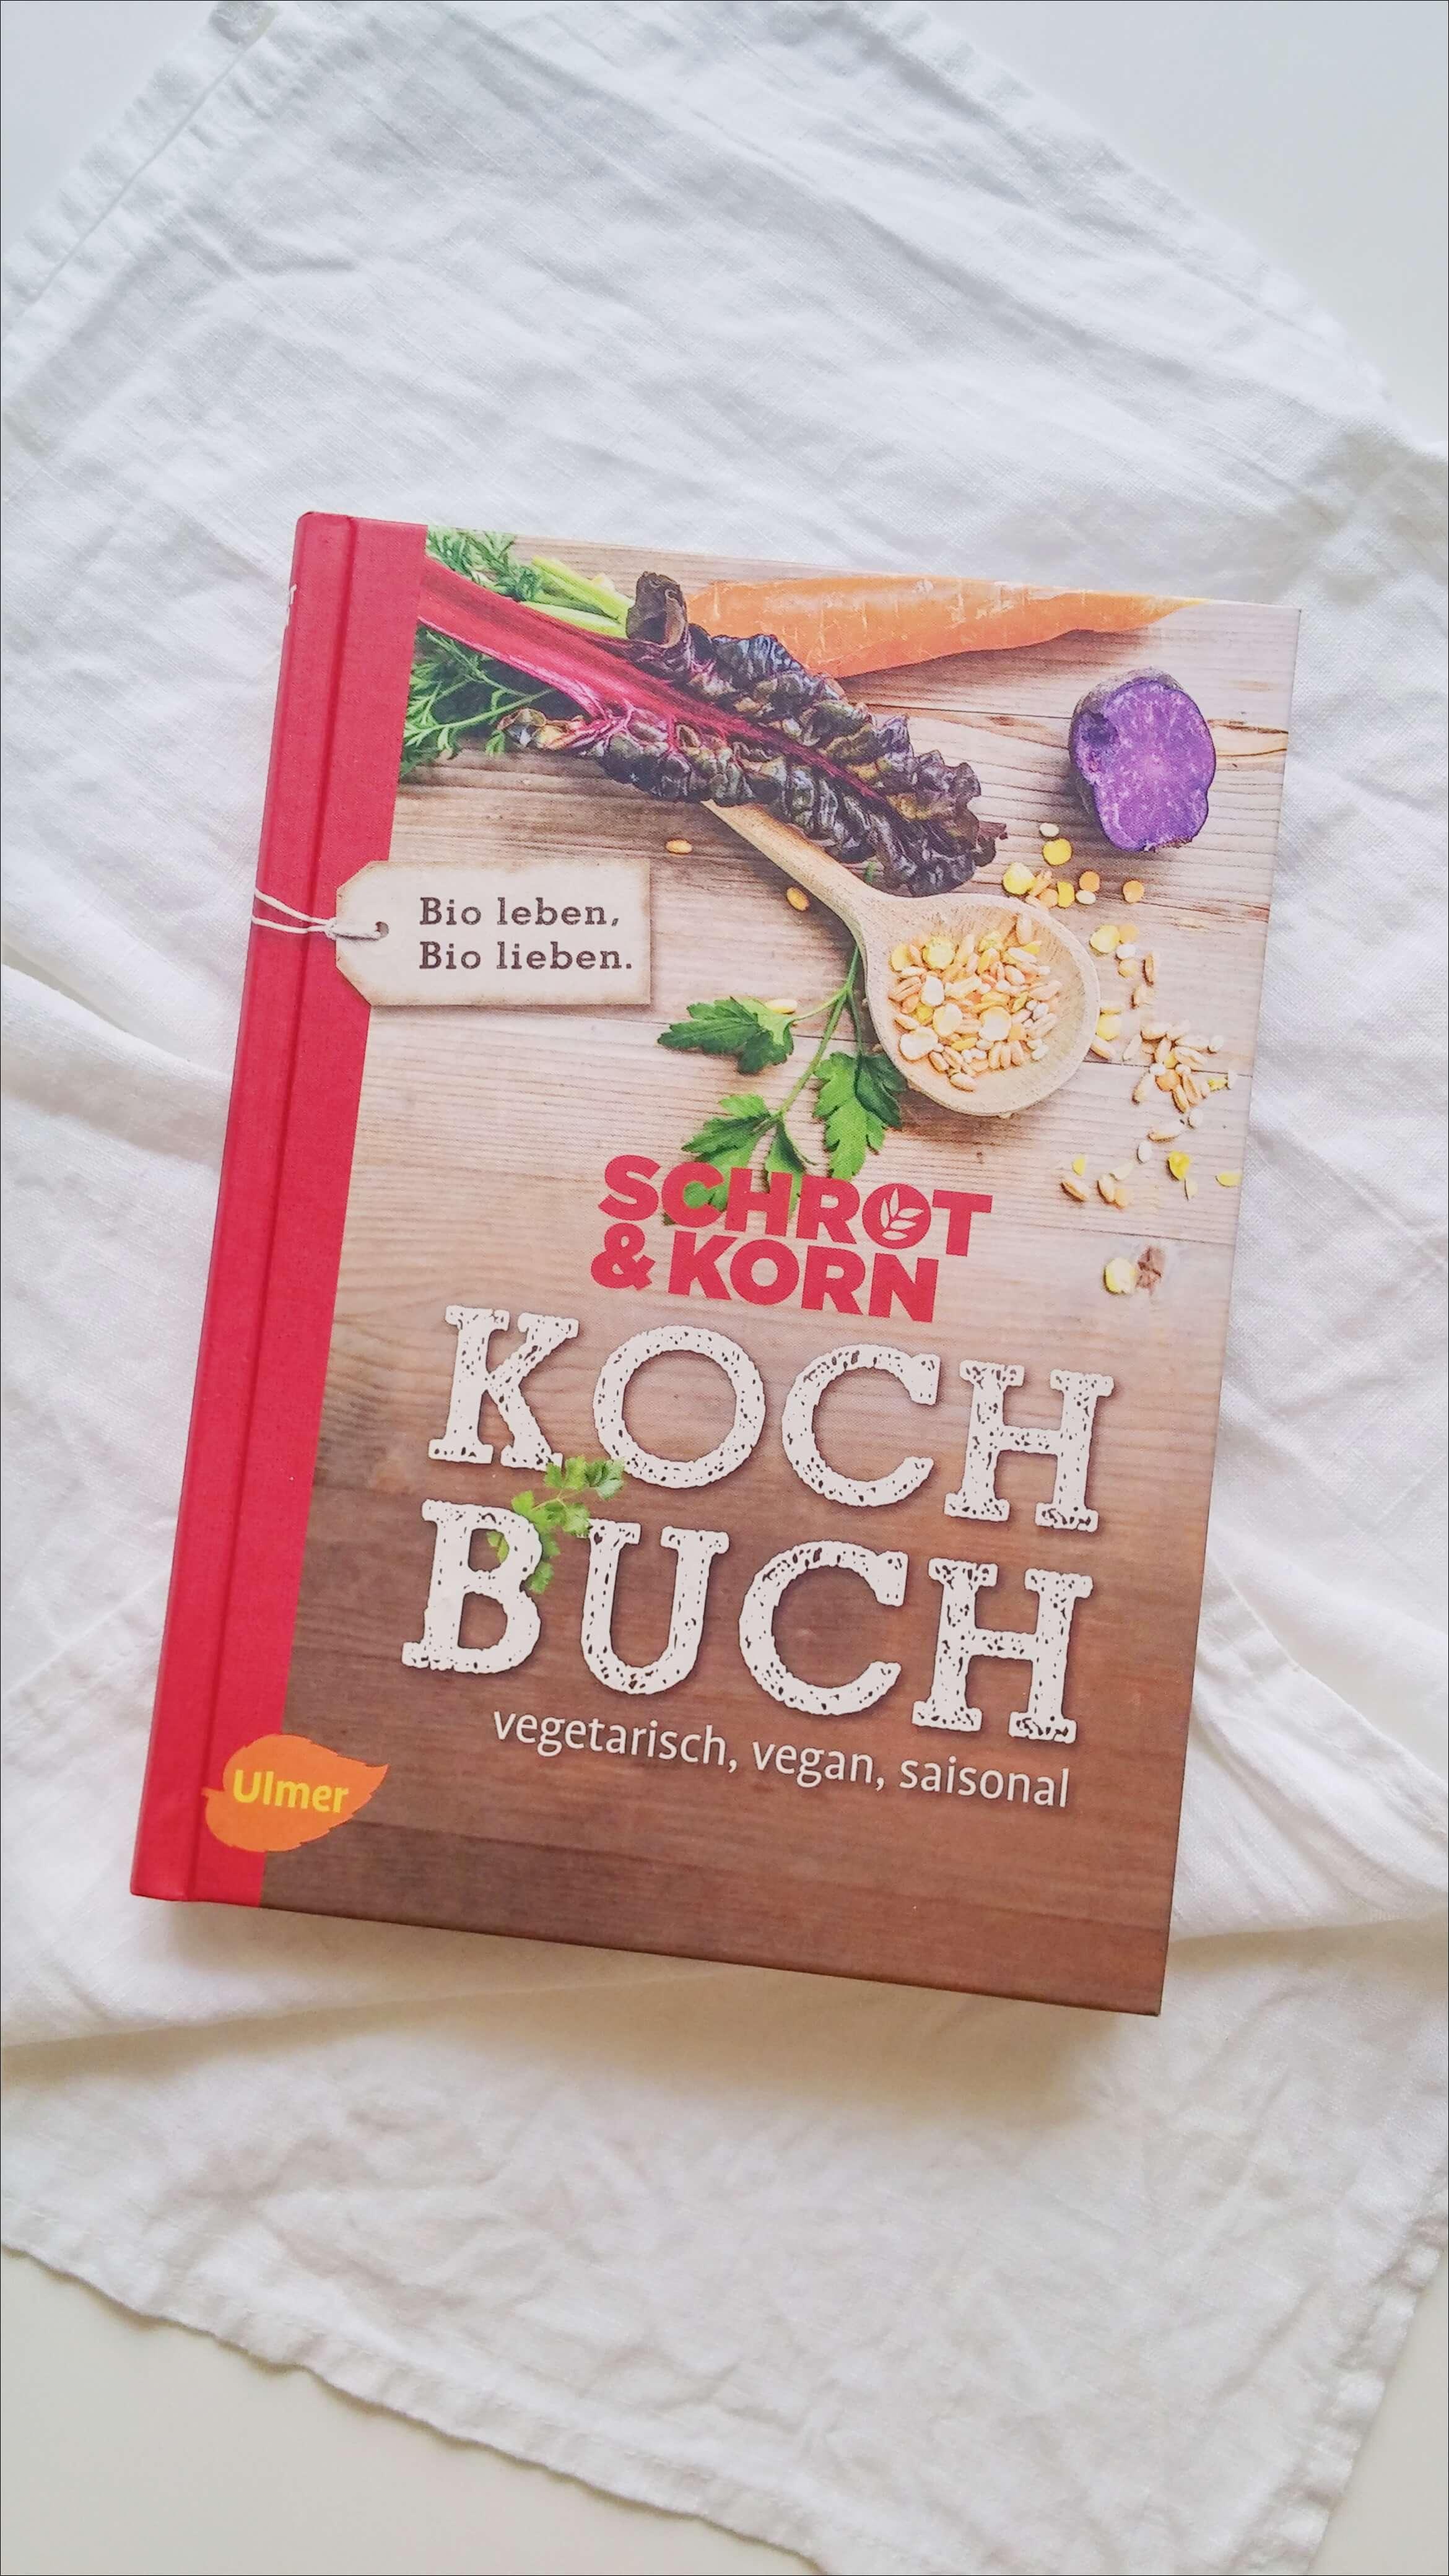 Schrot & Korn